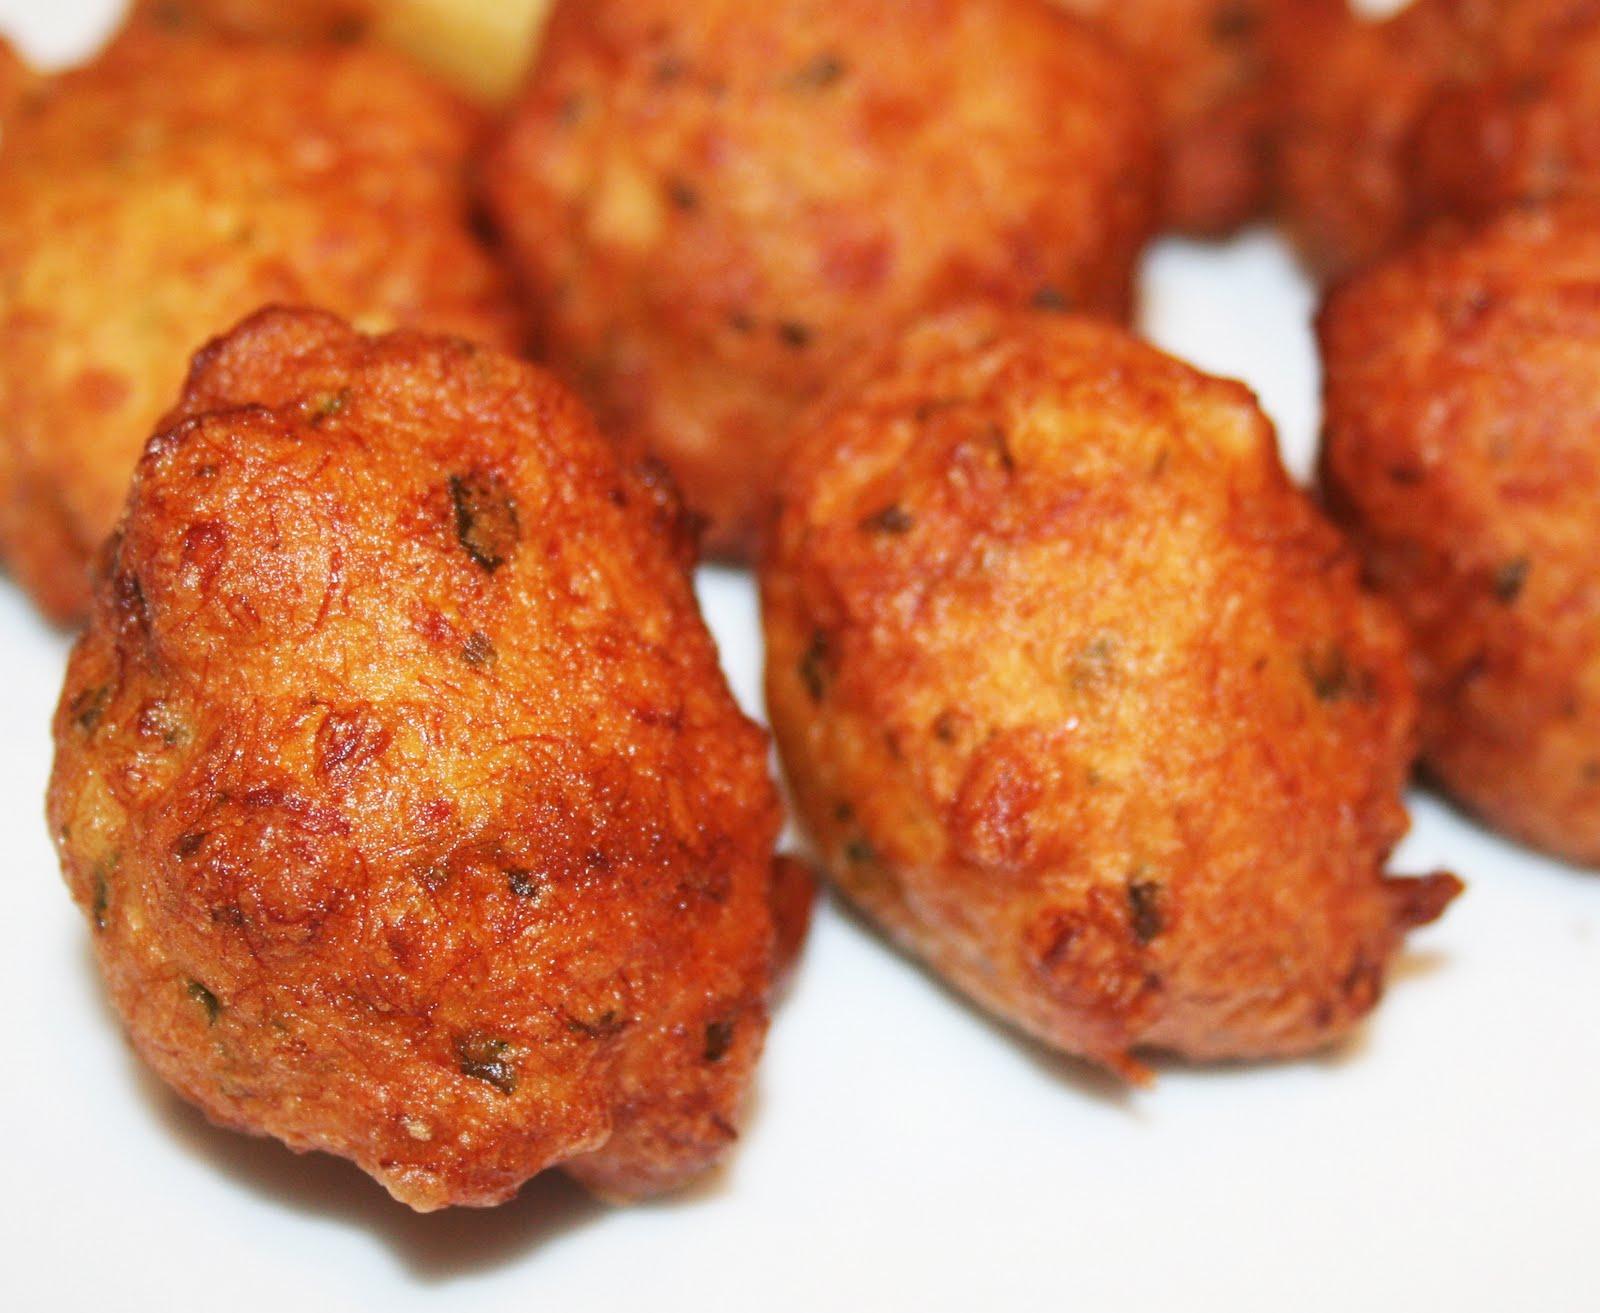 Relativ La Cuisine de Bernard : Accras Antillais IX09